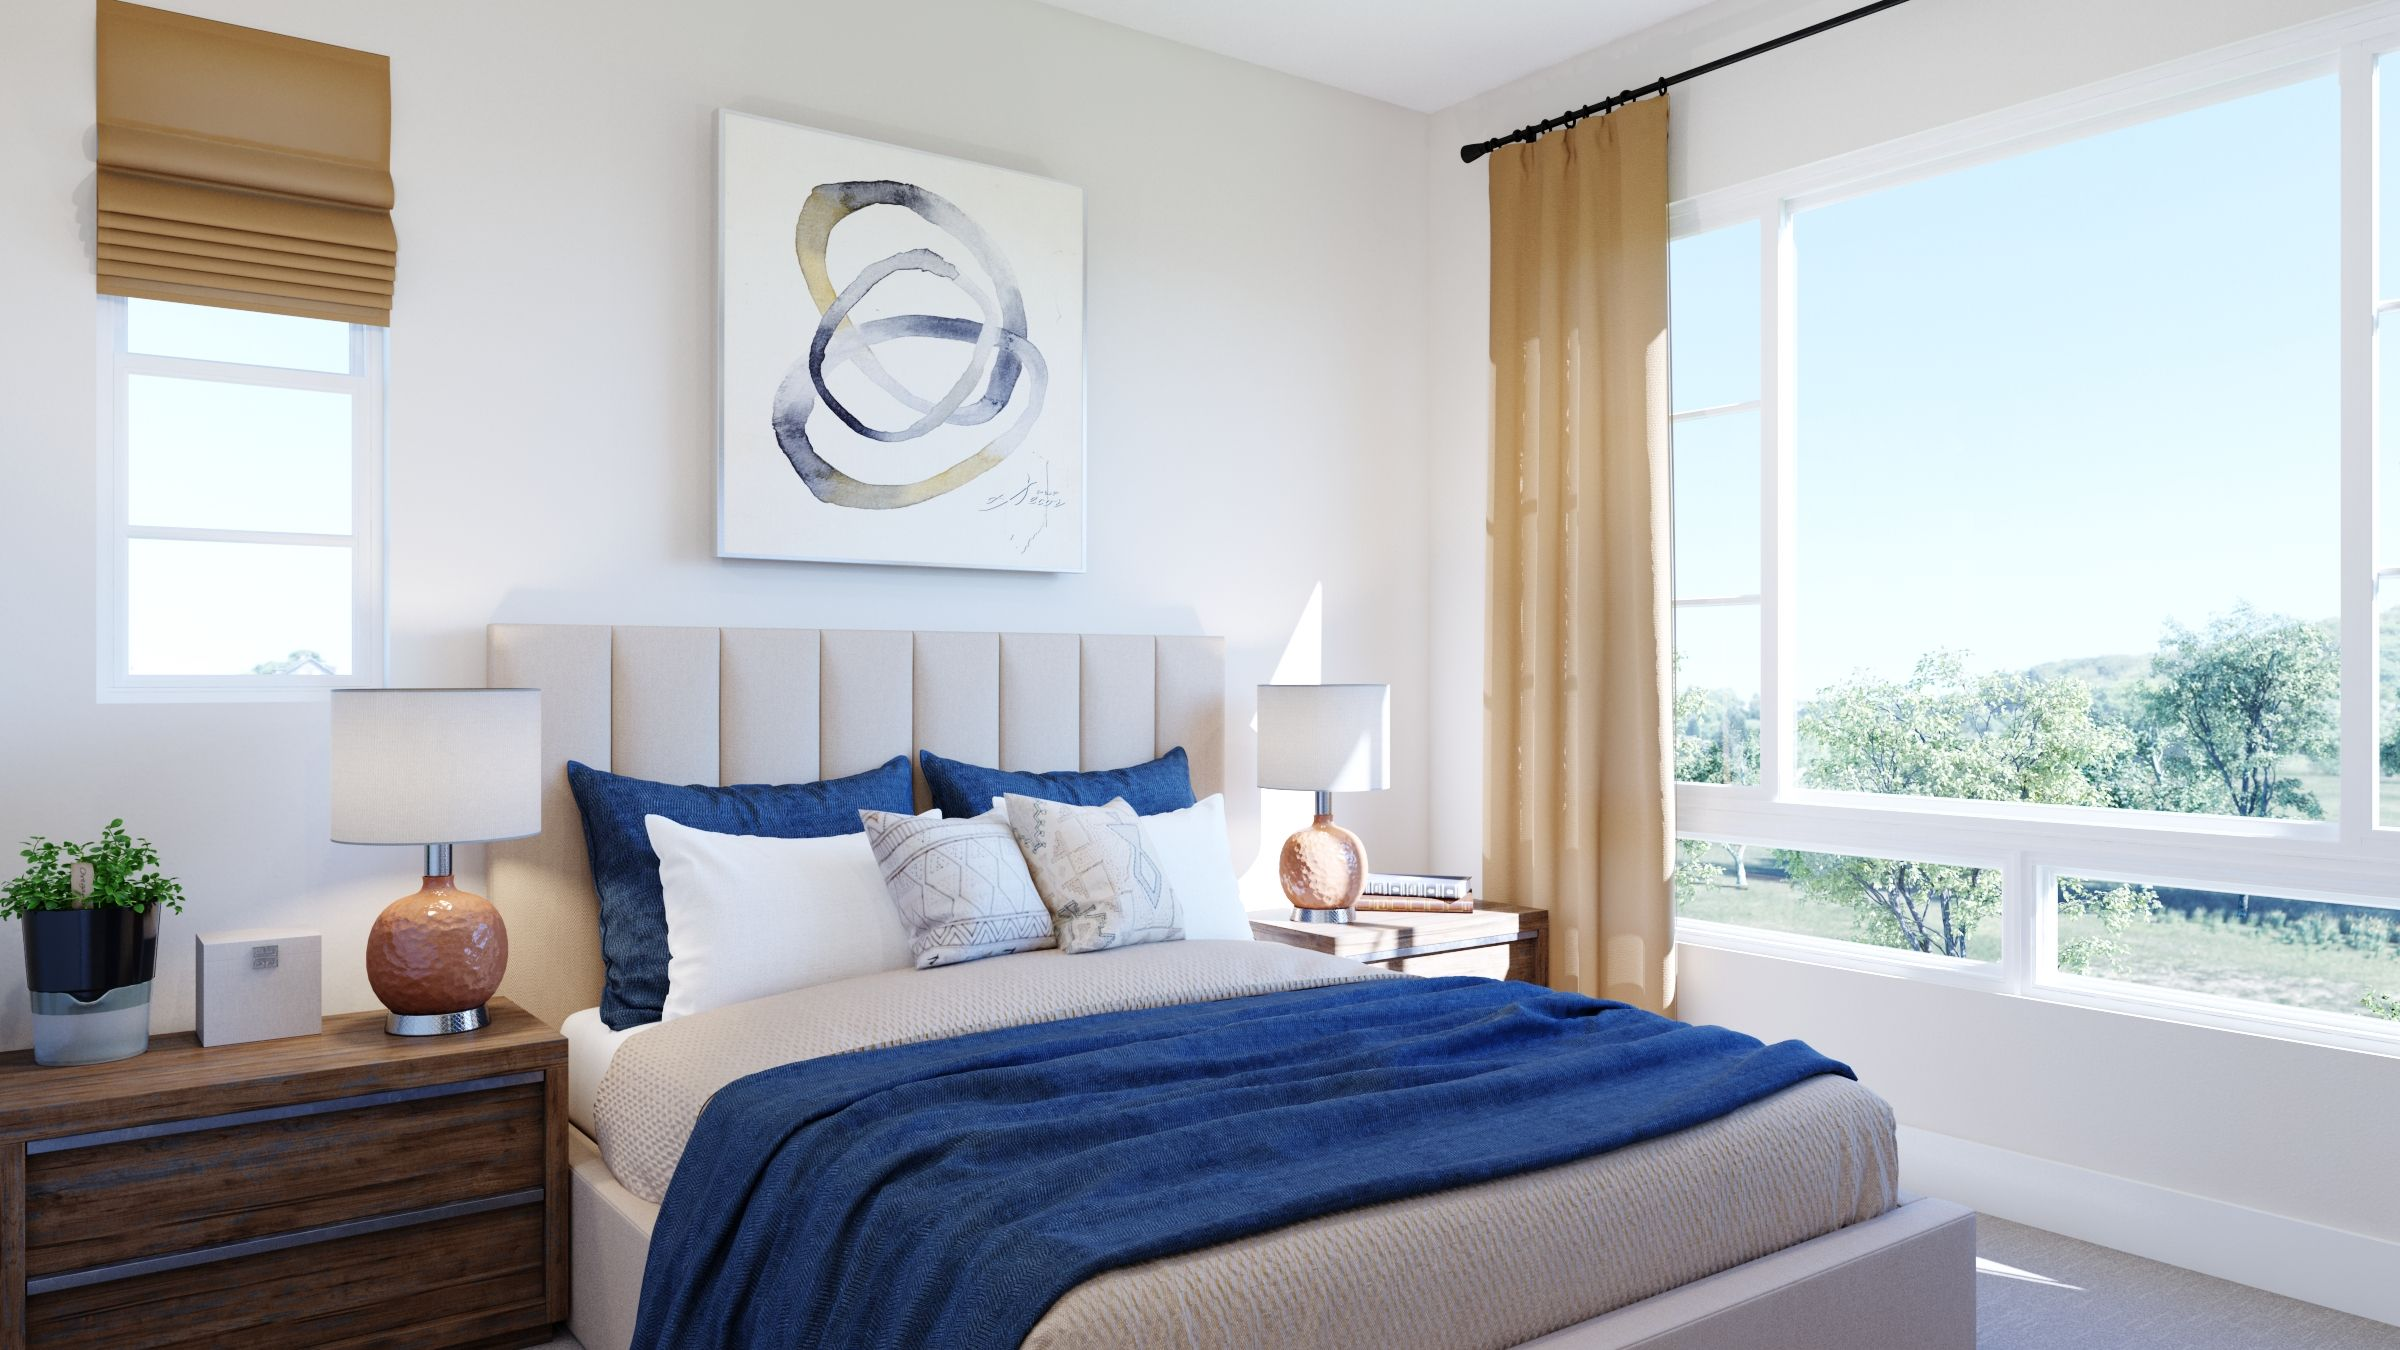 Bedroom featured in the Volara Plan 3 By Bonanni Development in Orange County, CA